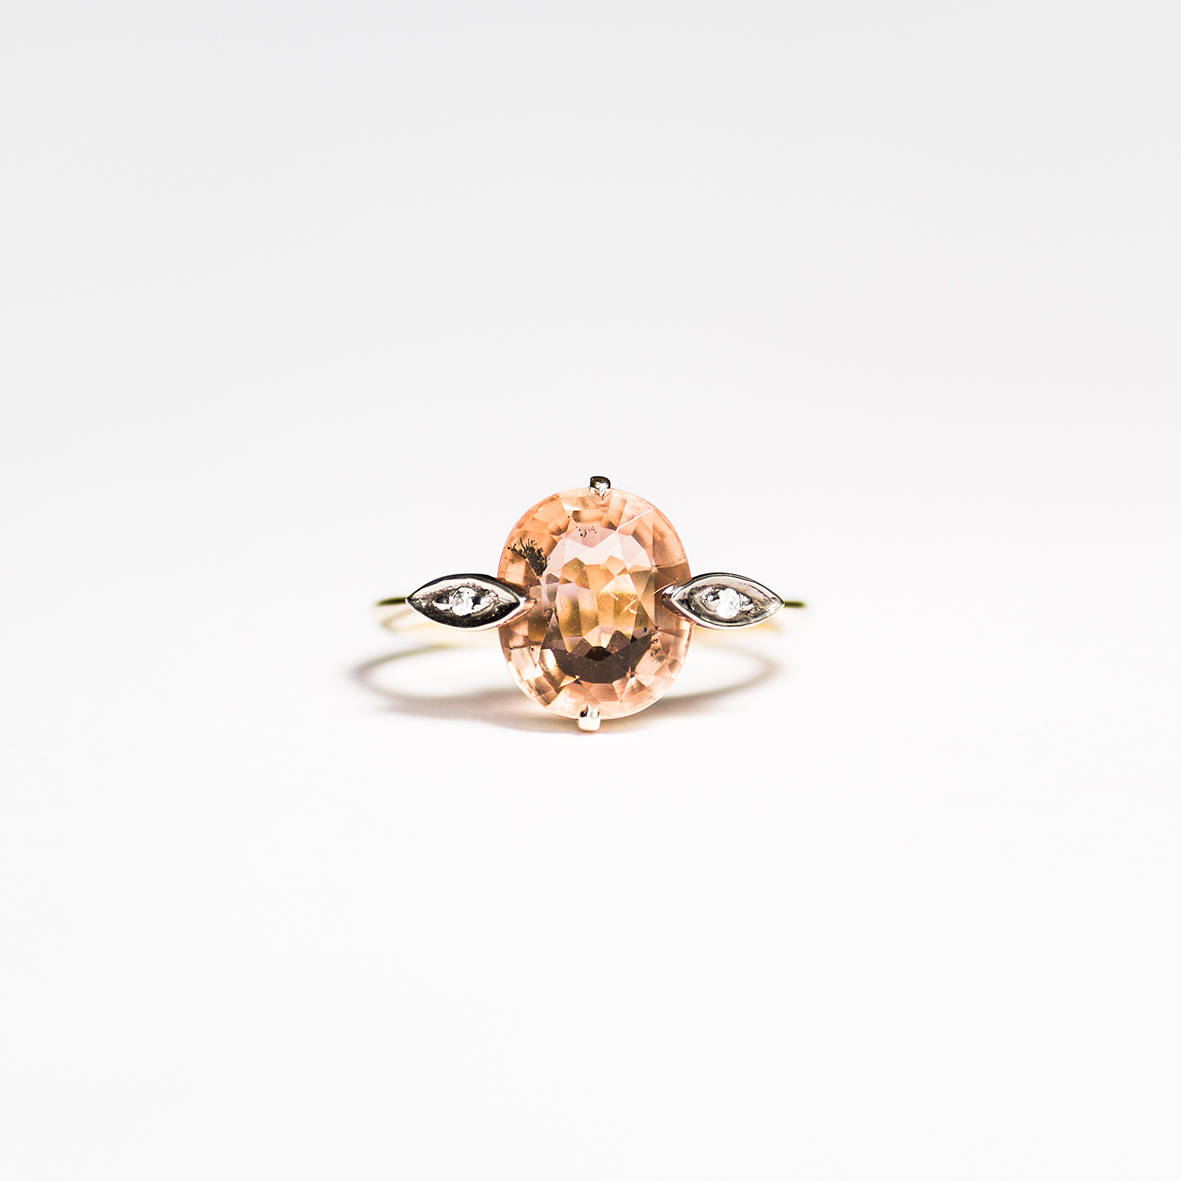 1. OONA_engagement_ficha1_peach tourmaline ring